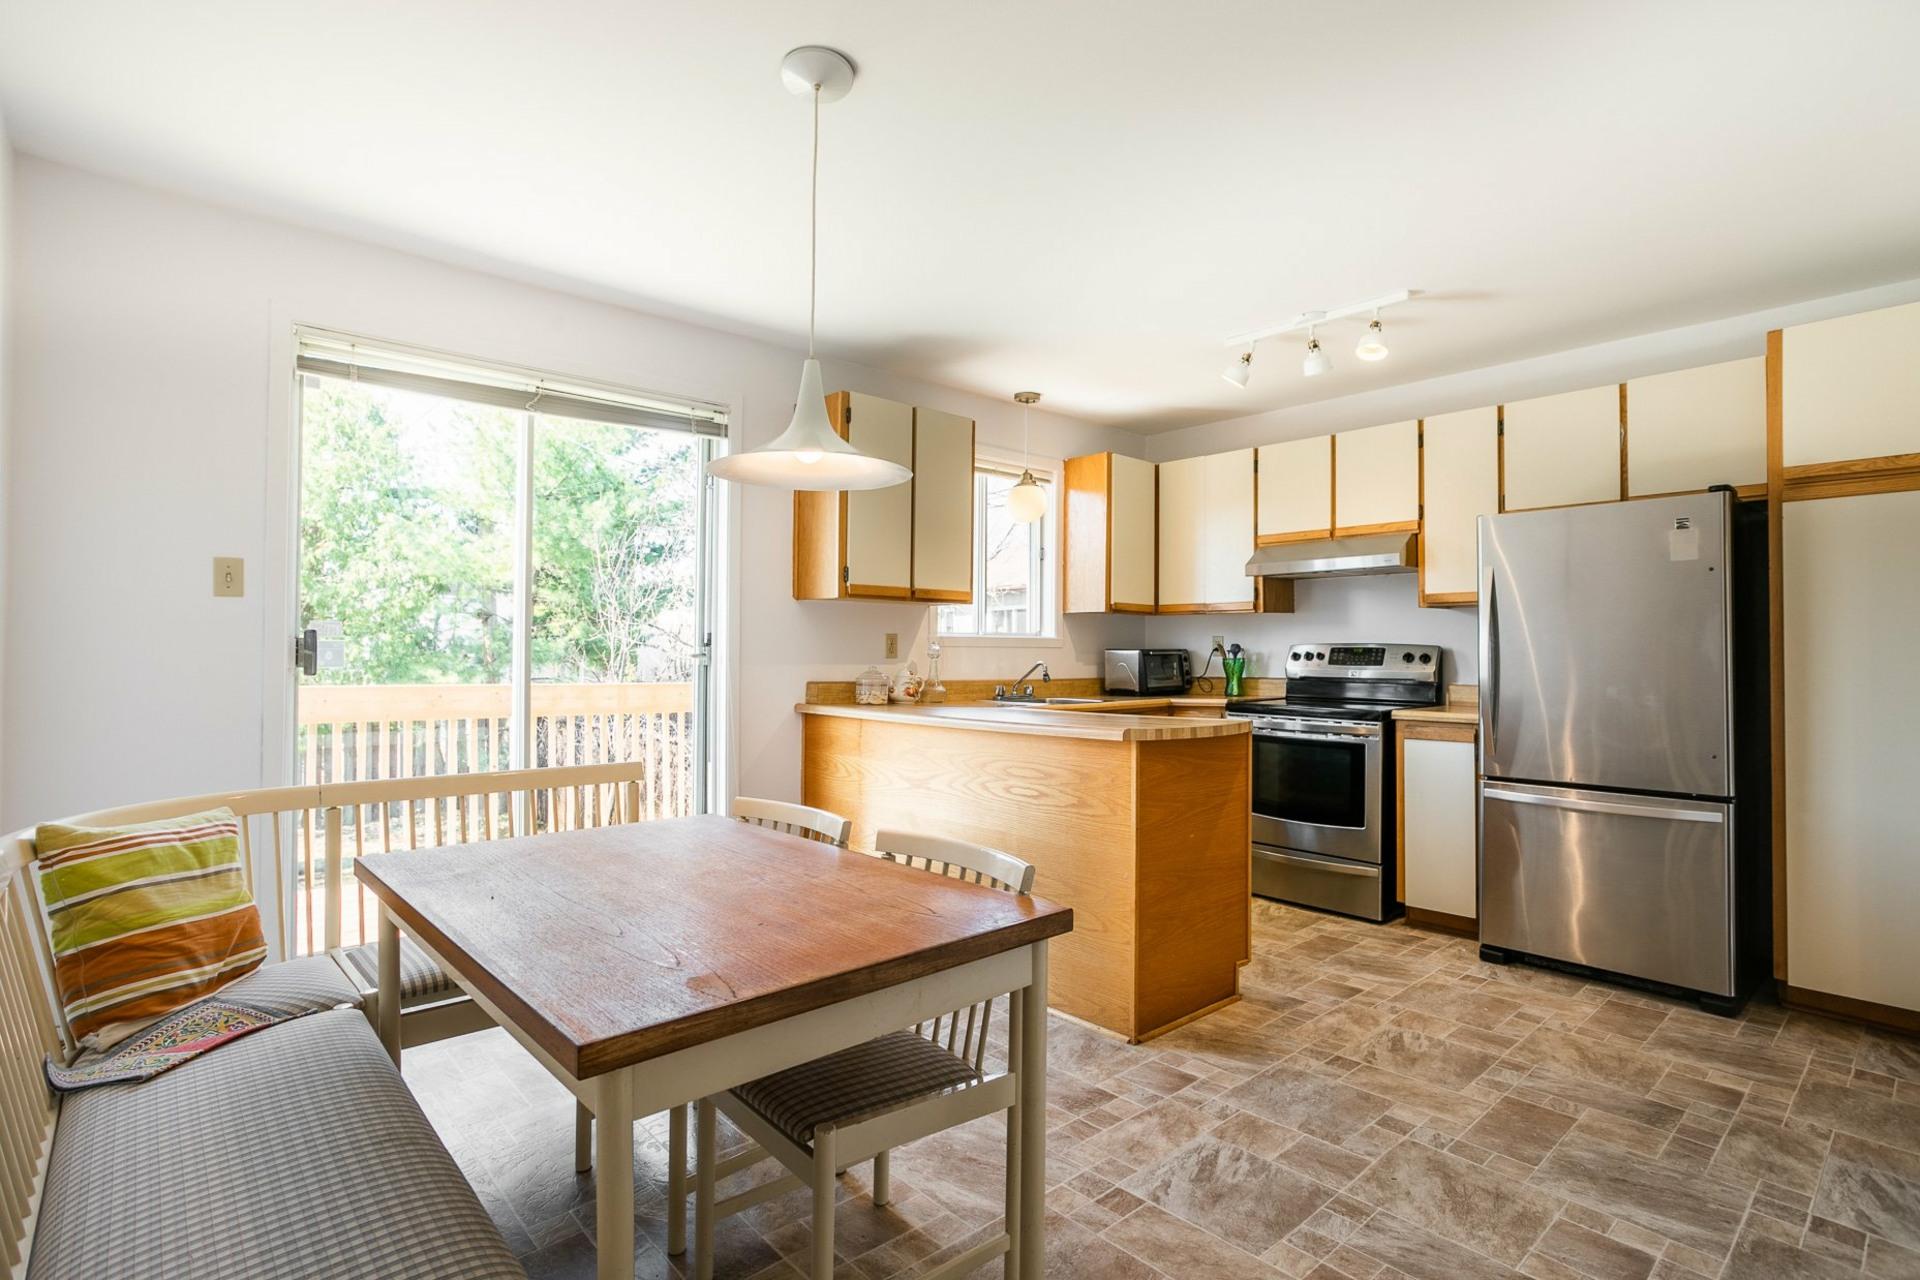 image 6 - House For sale Pierrefonds-Roxboro Montréal  - 8 rooms